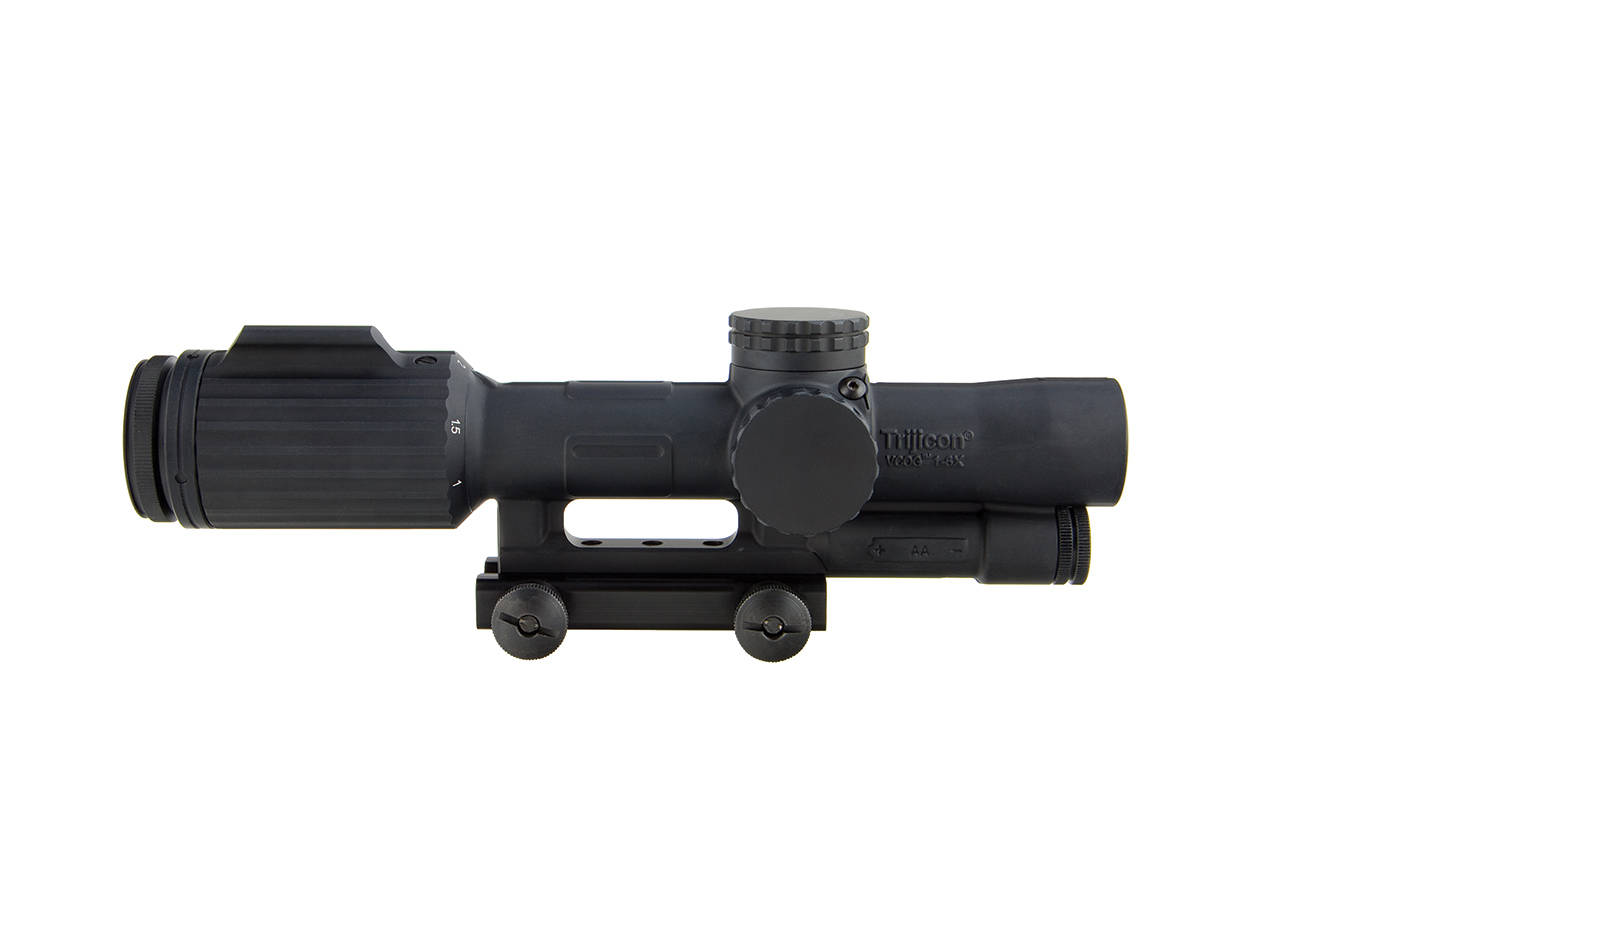 VC16-C-1600043 angle 6